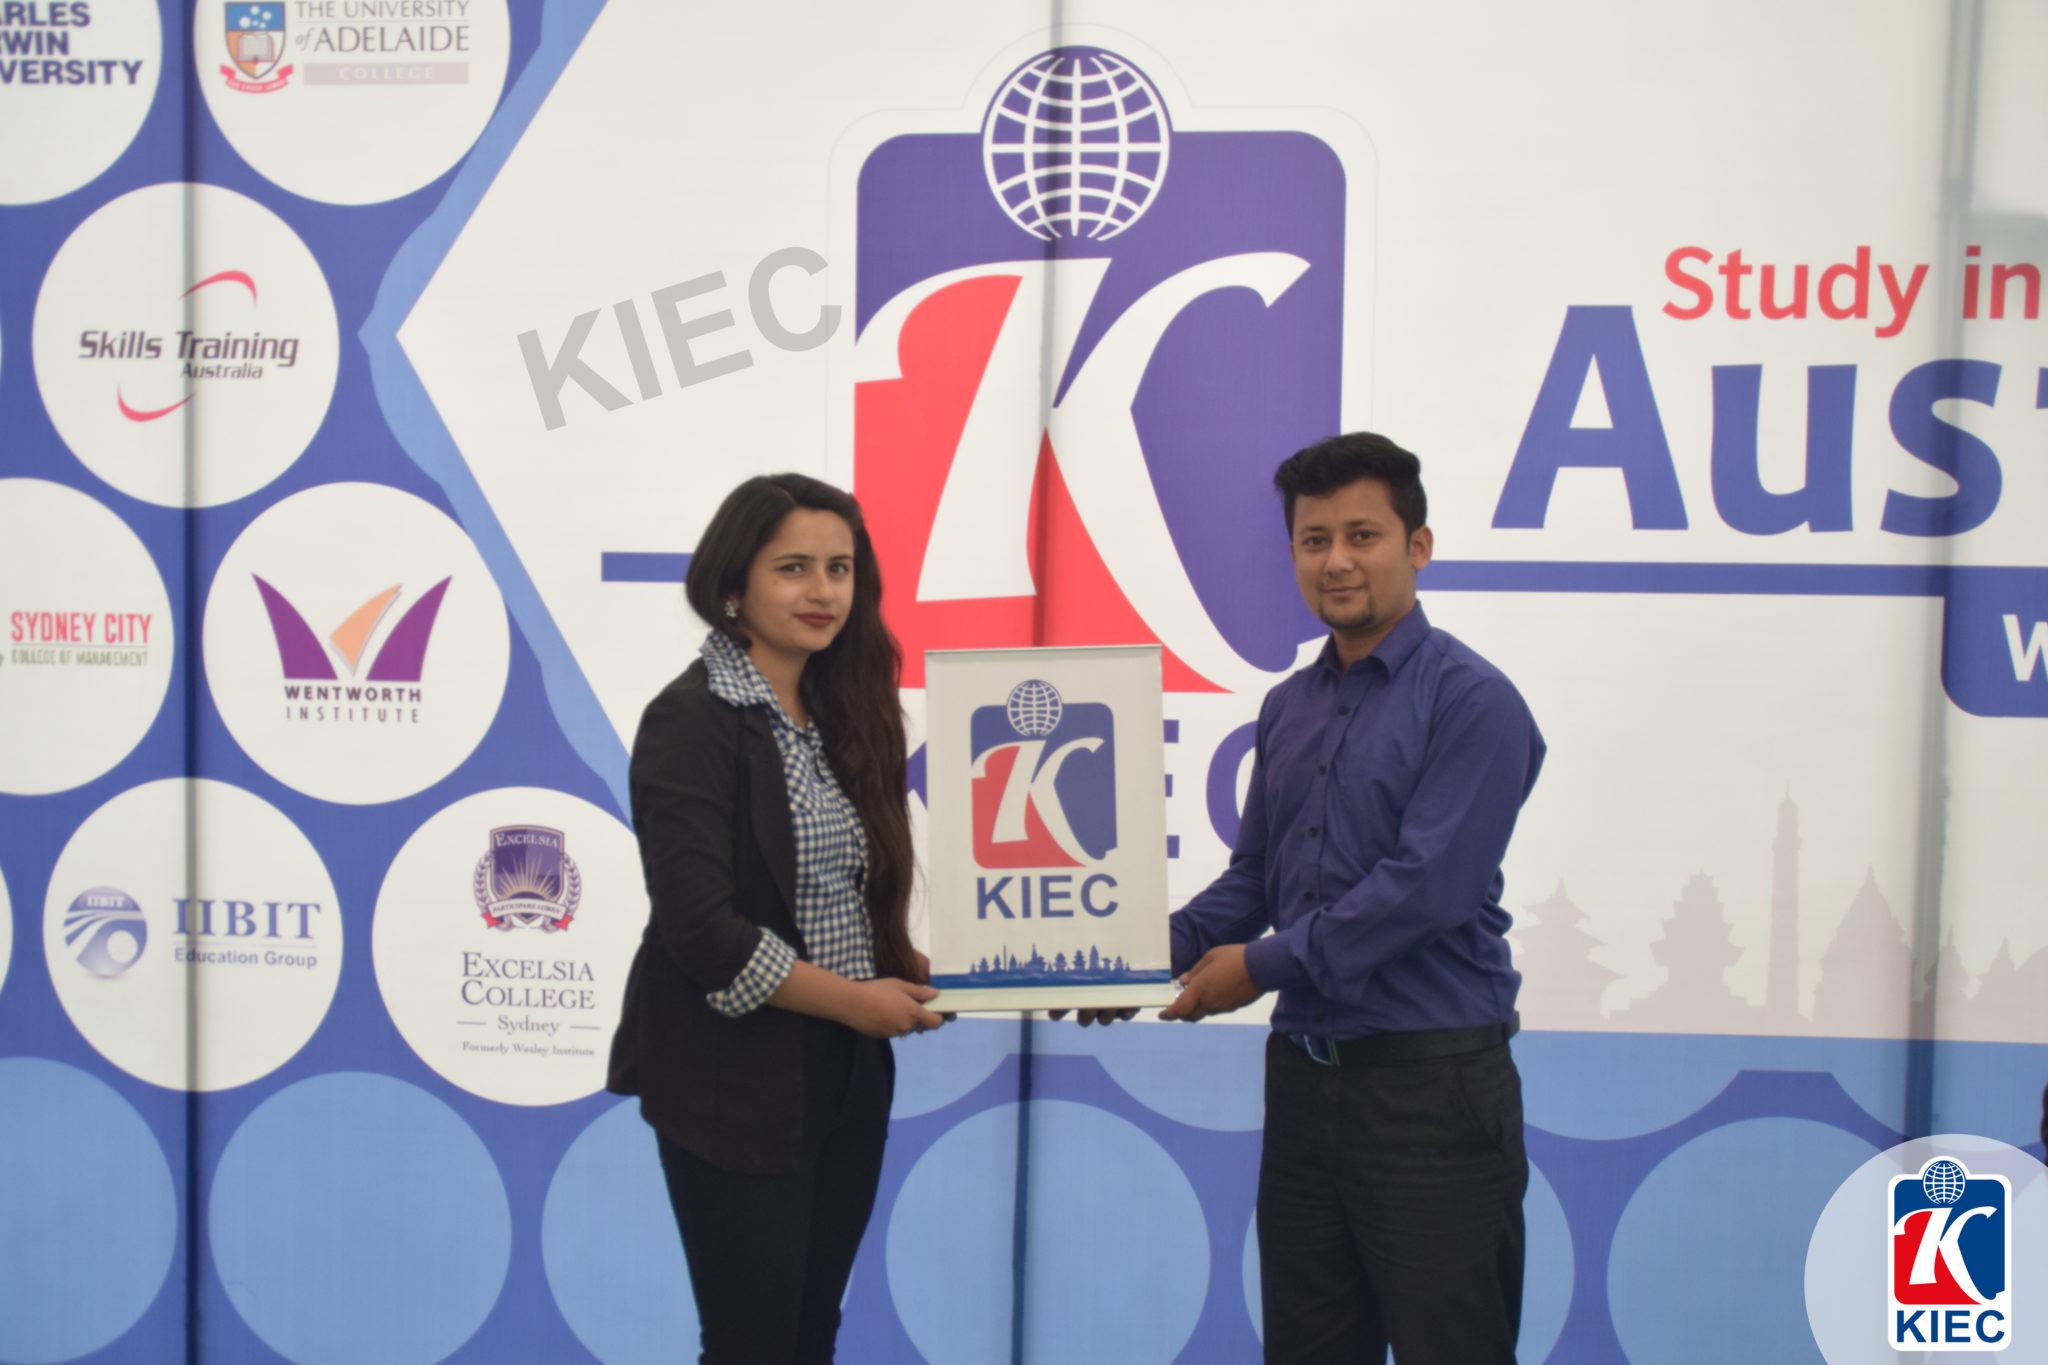 KIEC Pokhara counselor Bina Gautam and Sachin Ranabhat